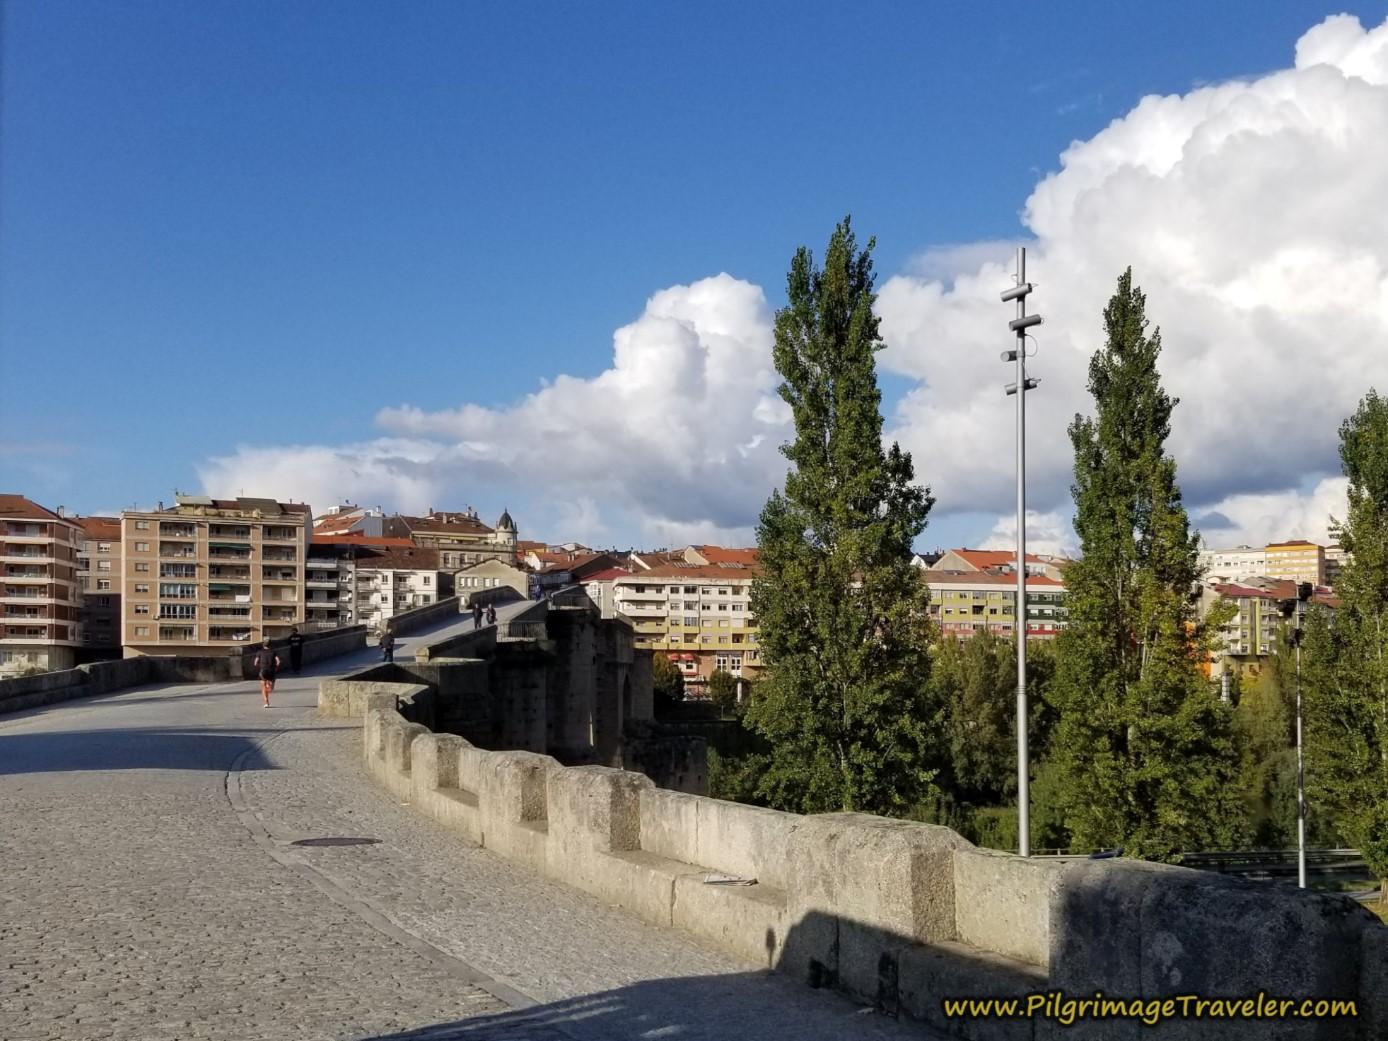 Across the Ponte de Romana de Ourense